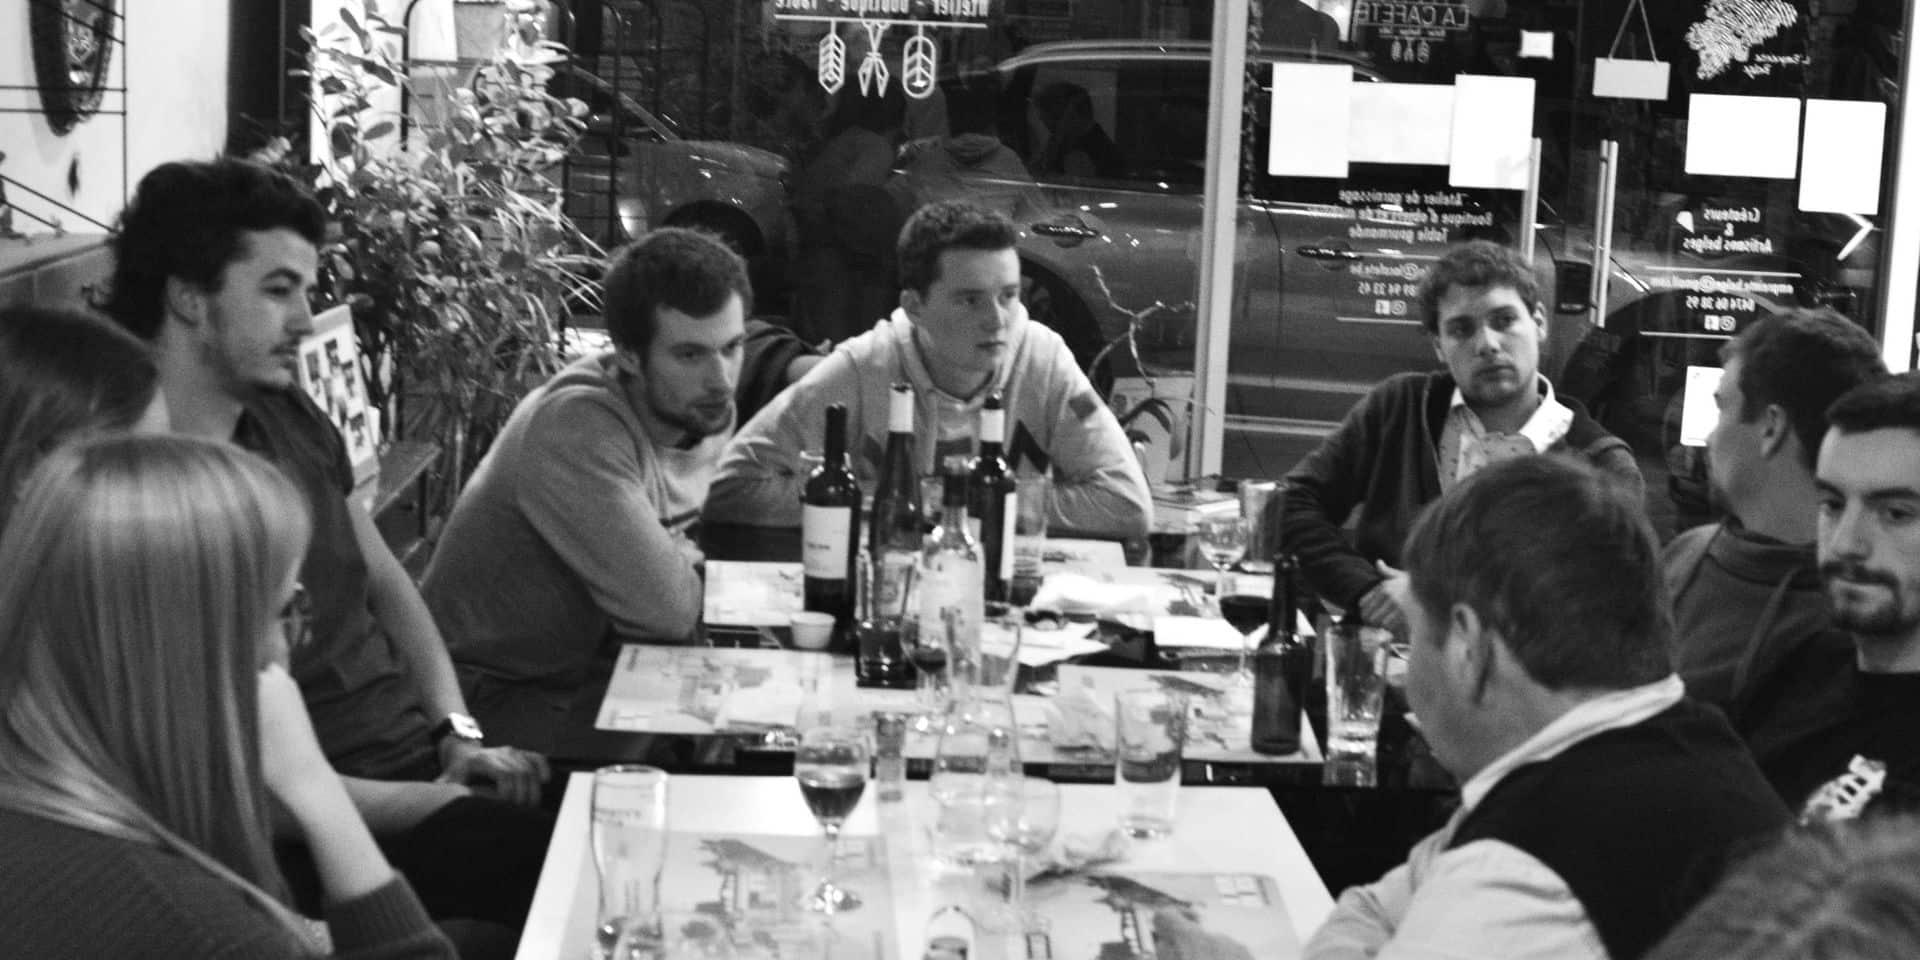 Mercredi, c'est spaghetti entre amis rue des Carmes